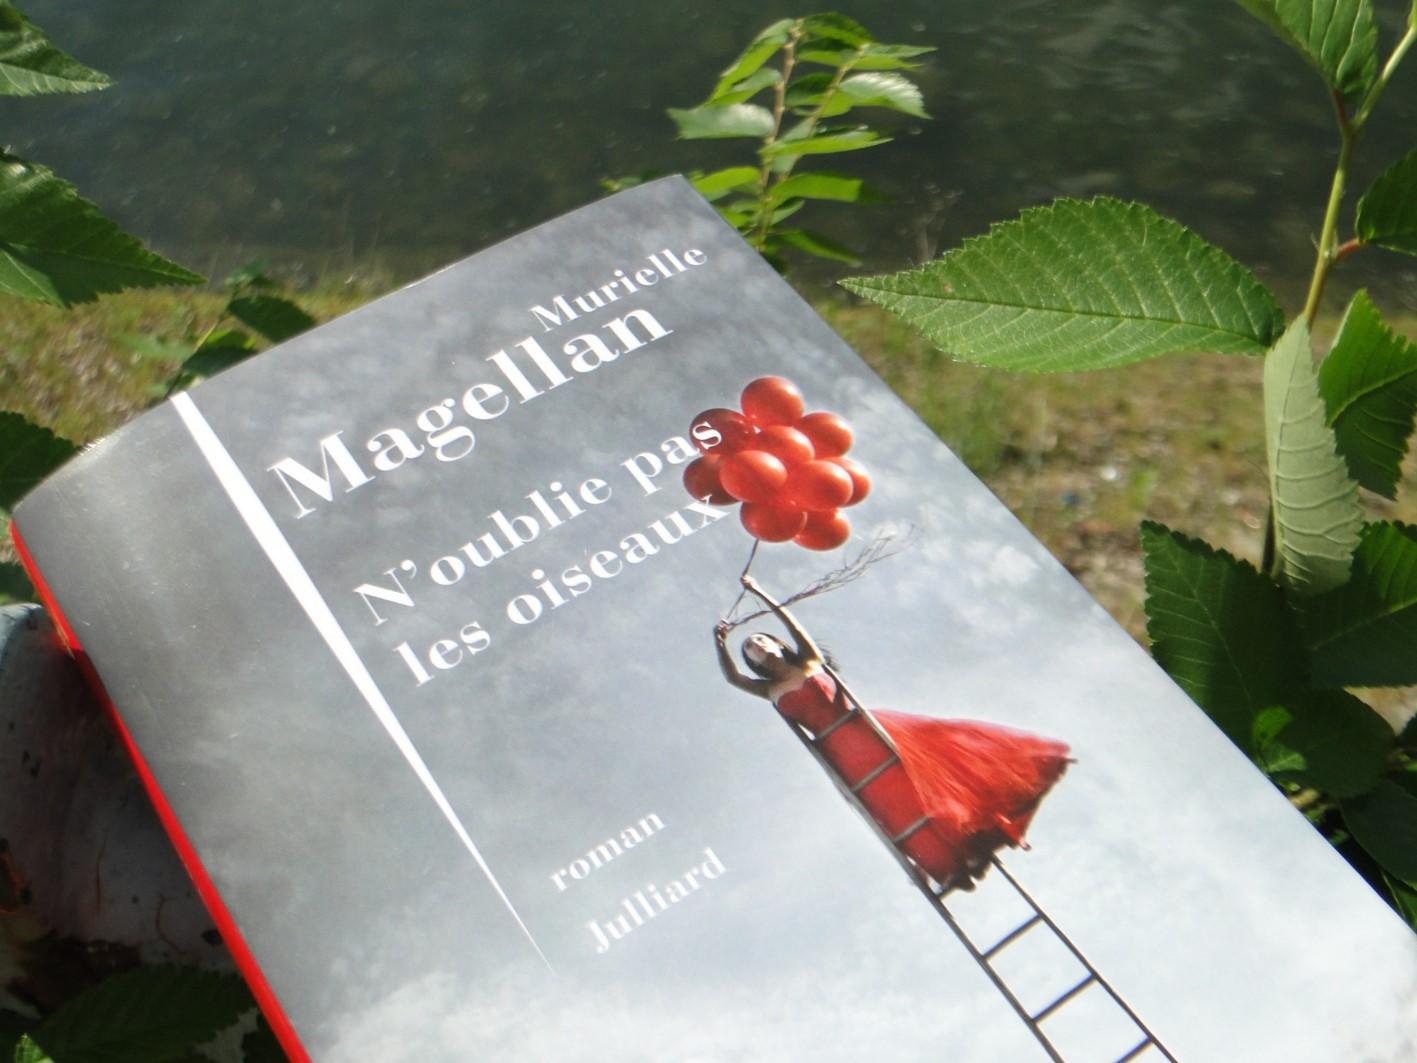 N'OUBLIES PAS LES OISEAUX Murielle Magellan - Go with the Blog 3